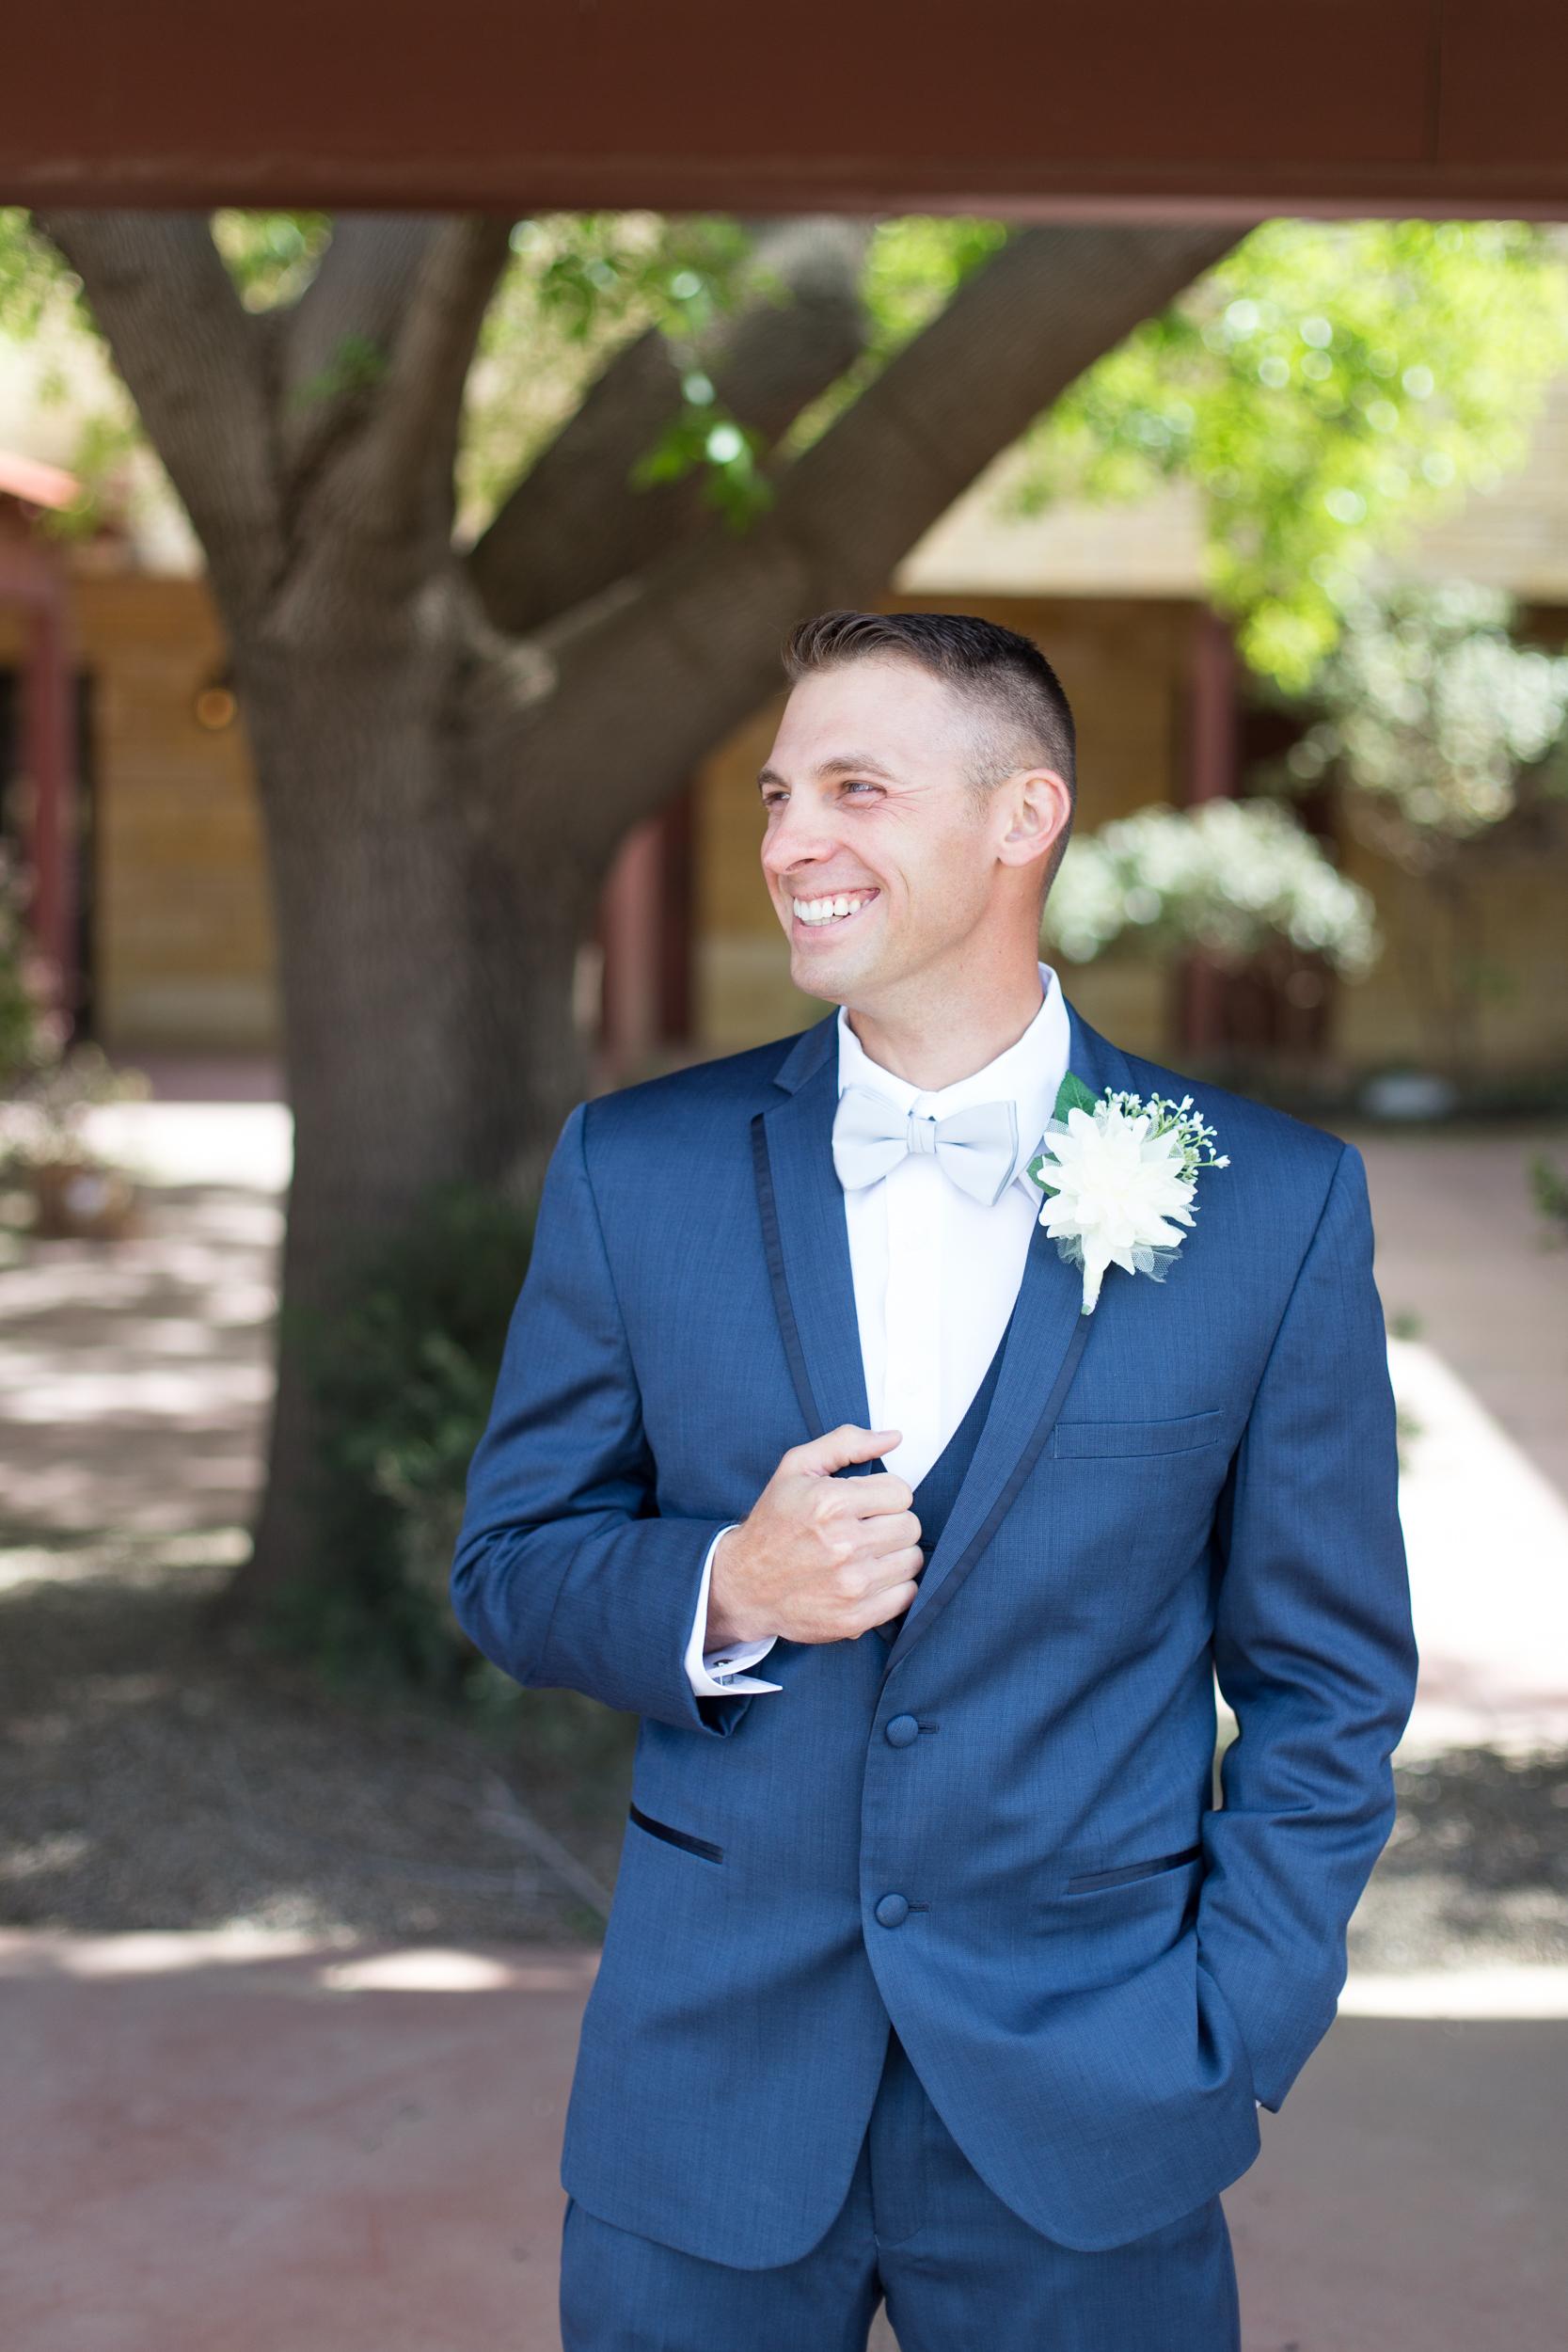 hall_wedding blog_kelsie hendricks photography_odessa_ west texas-45.jpg